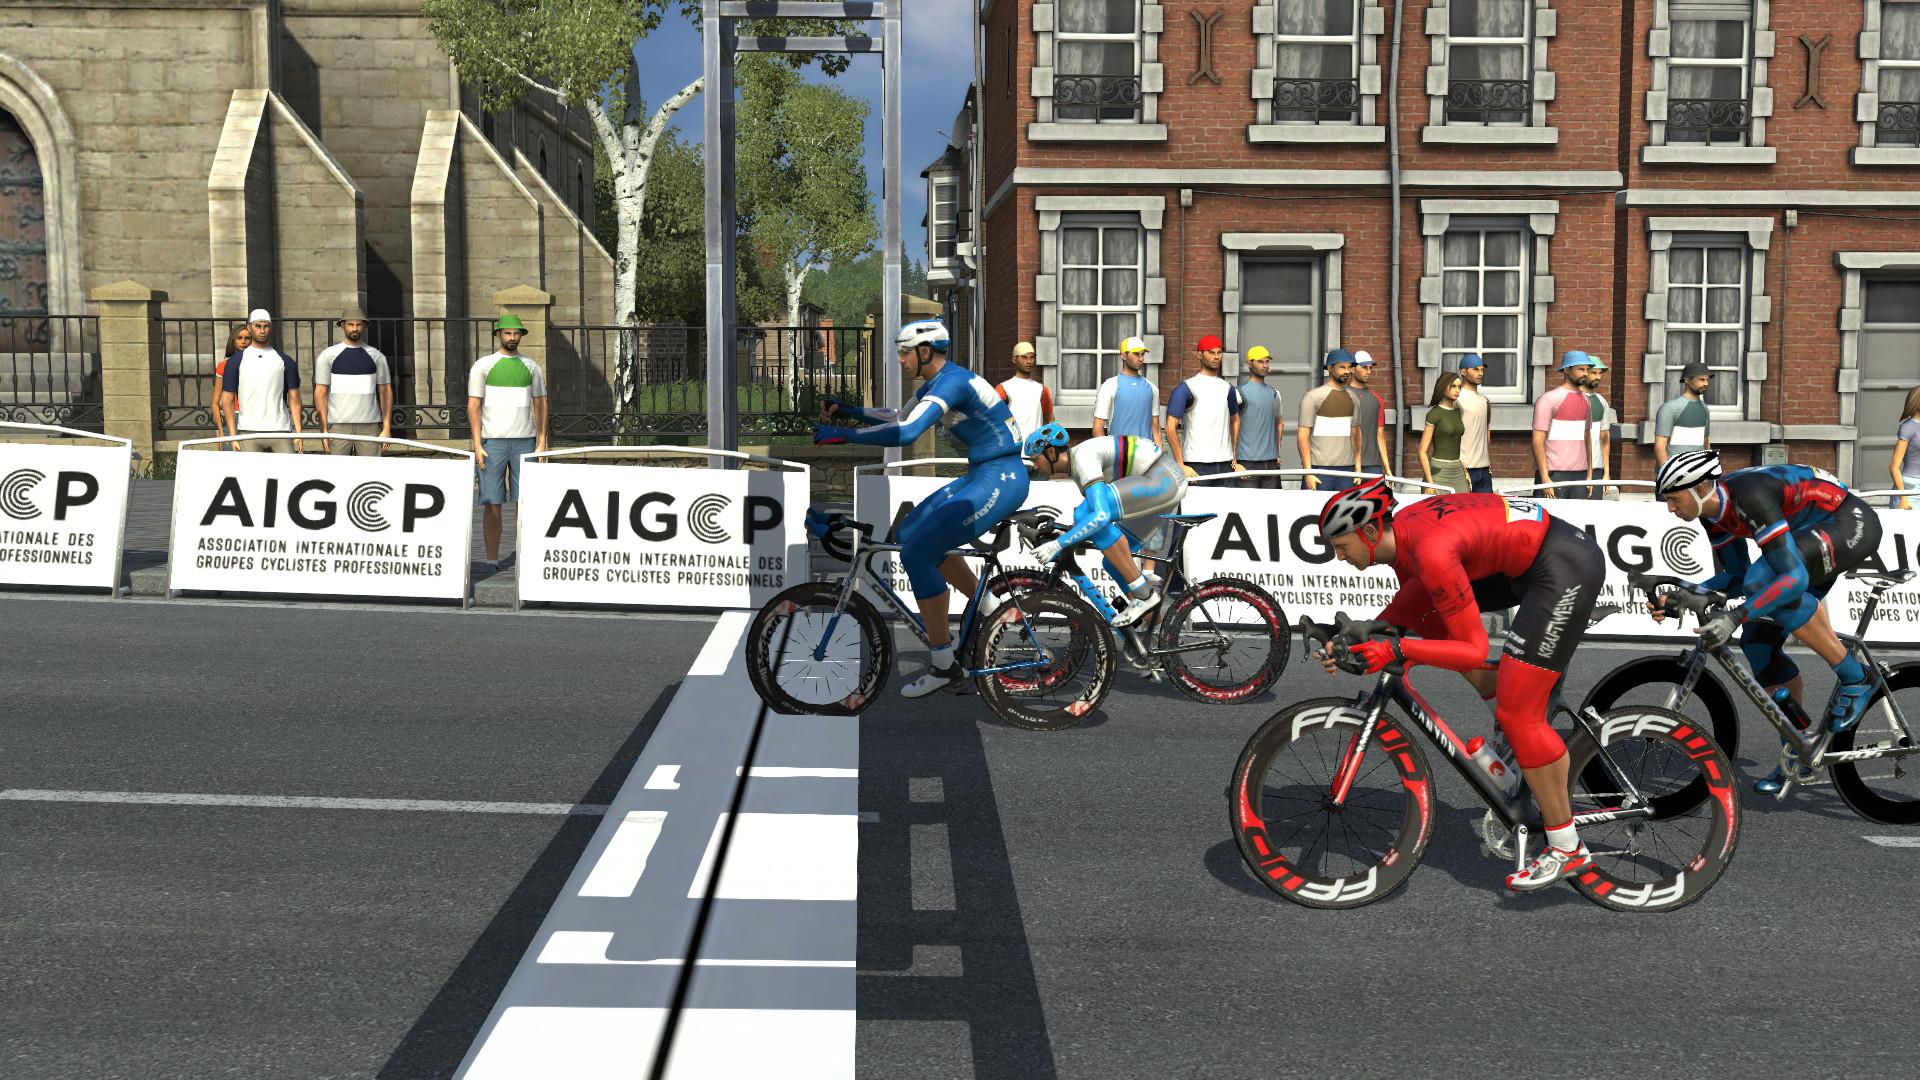 pcmdaily.com/images/mg/2019/Races/C1/Uppsala/E2/22.jpg